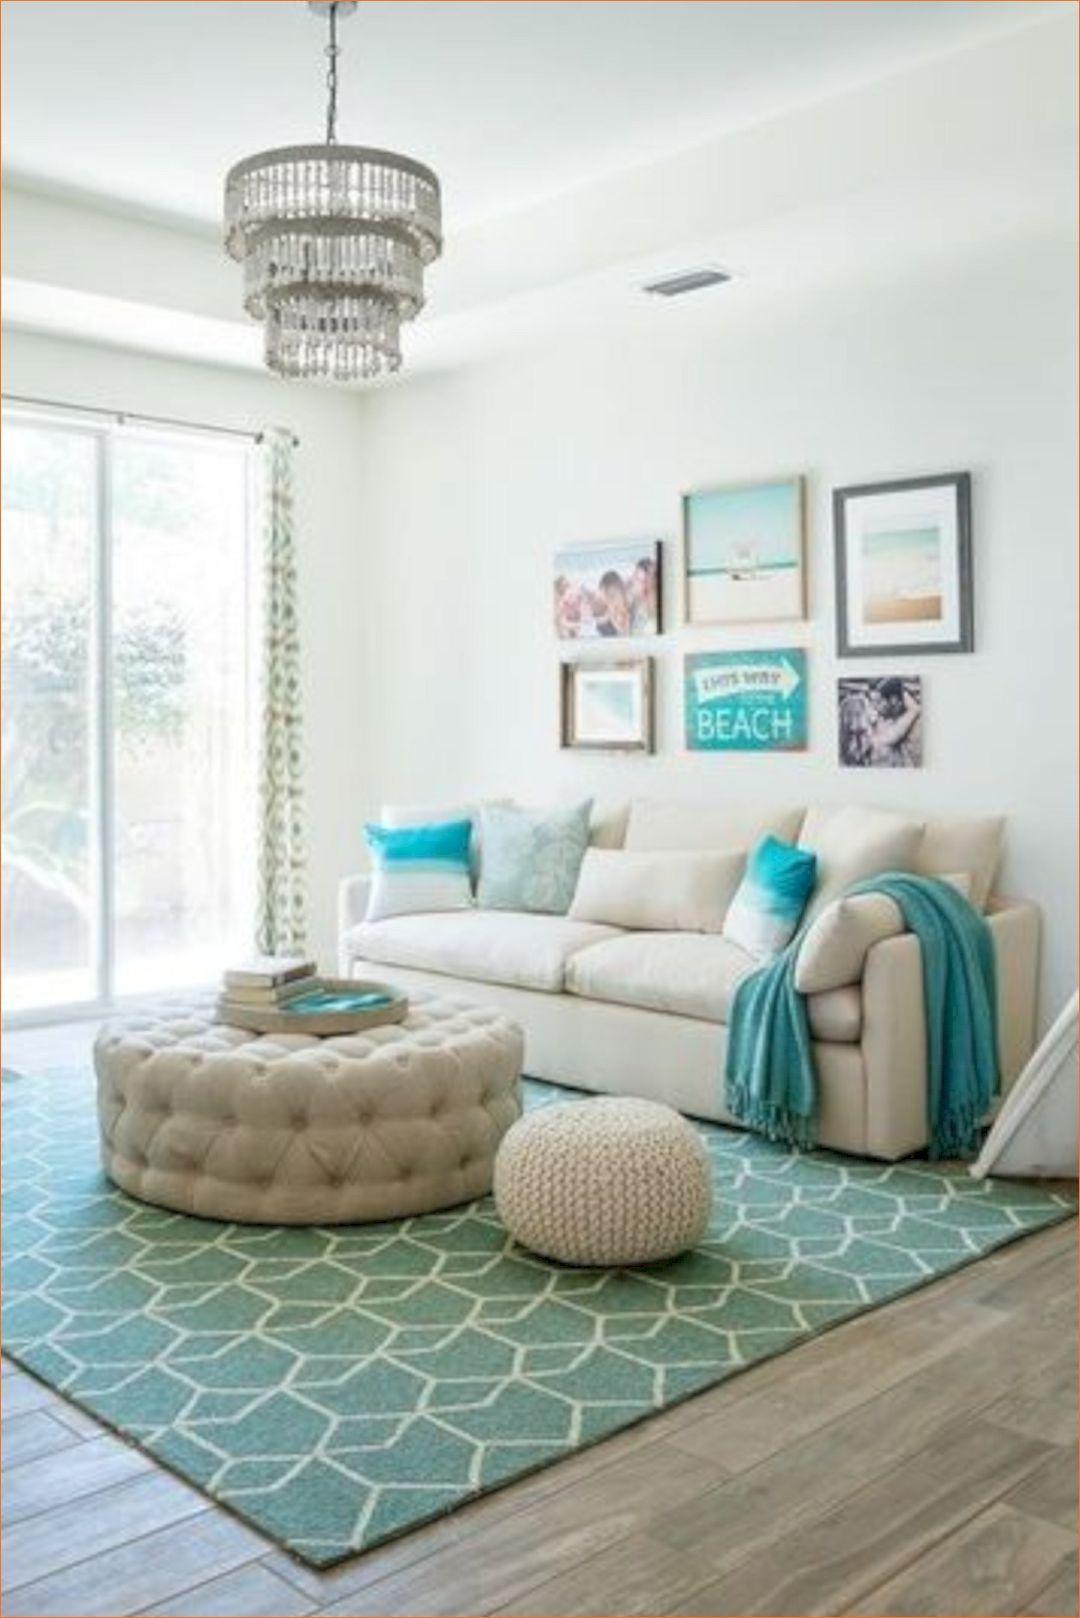 12 Small Coastal Living Room Decor Ideas With Great Style Beach Theme Living Room Beach Living Room Beachy Living Room